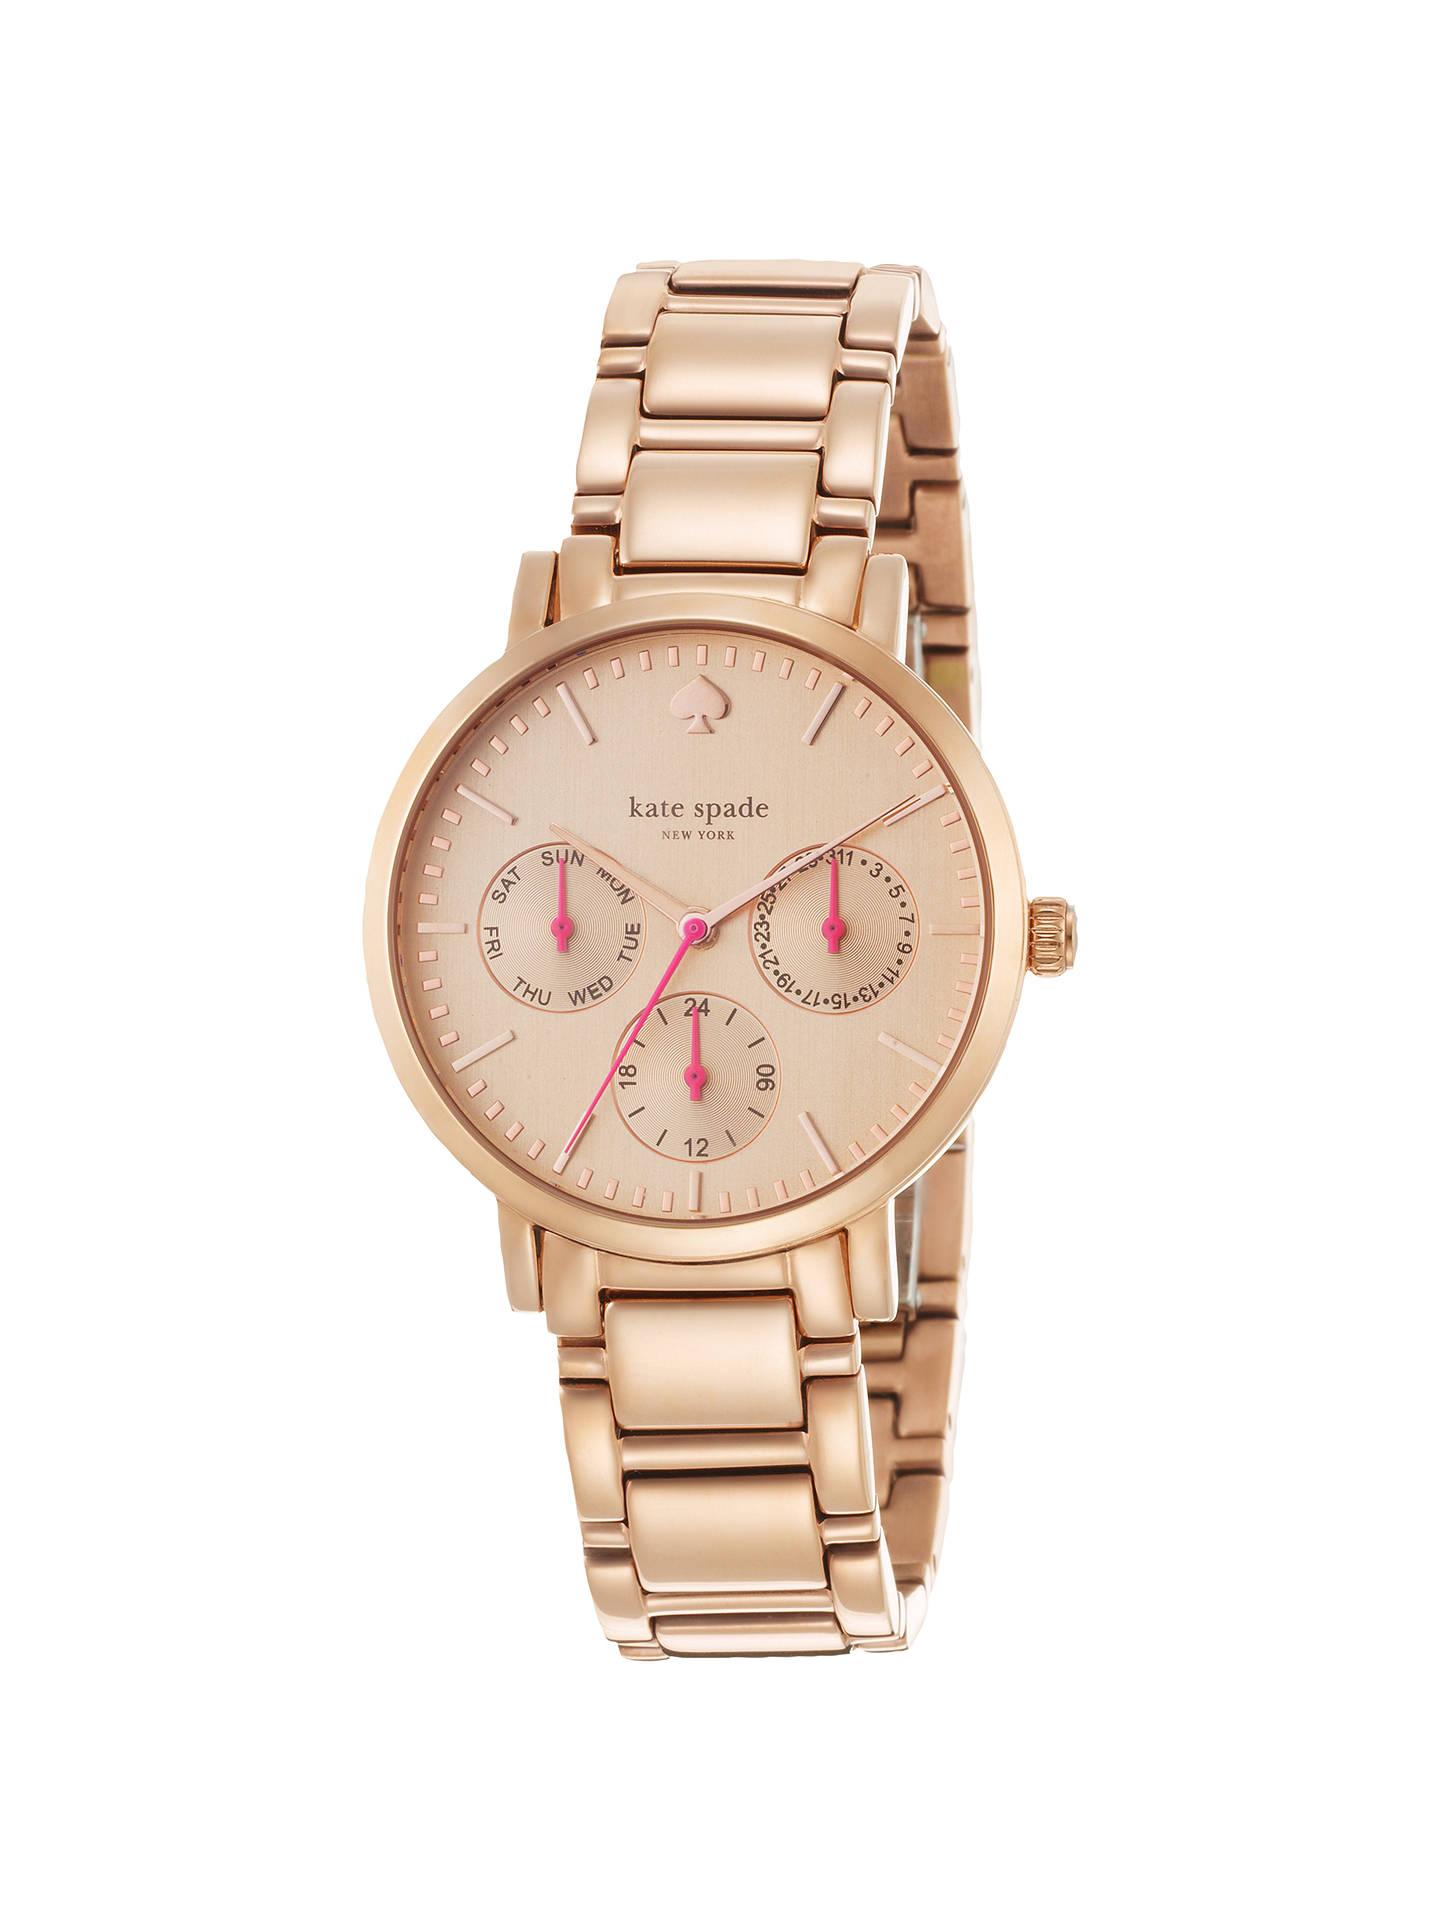 b62d82921 Buy kate spade new york 1YRU0470 Women's Gramercy Chronograph Watch, Rose  Gold Online at johnlewis